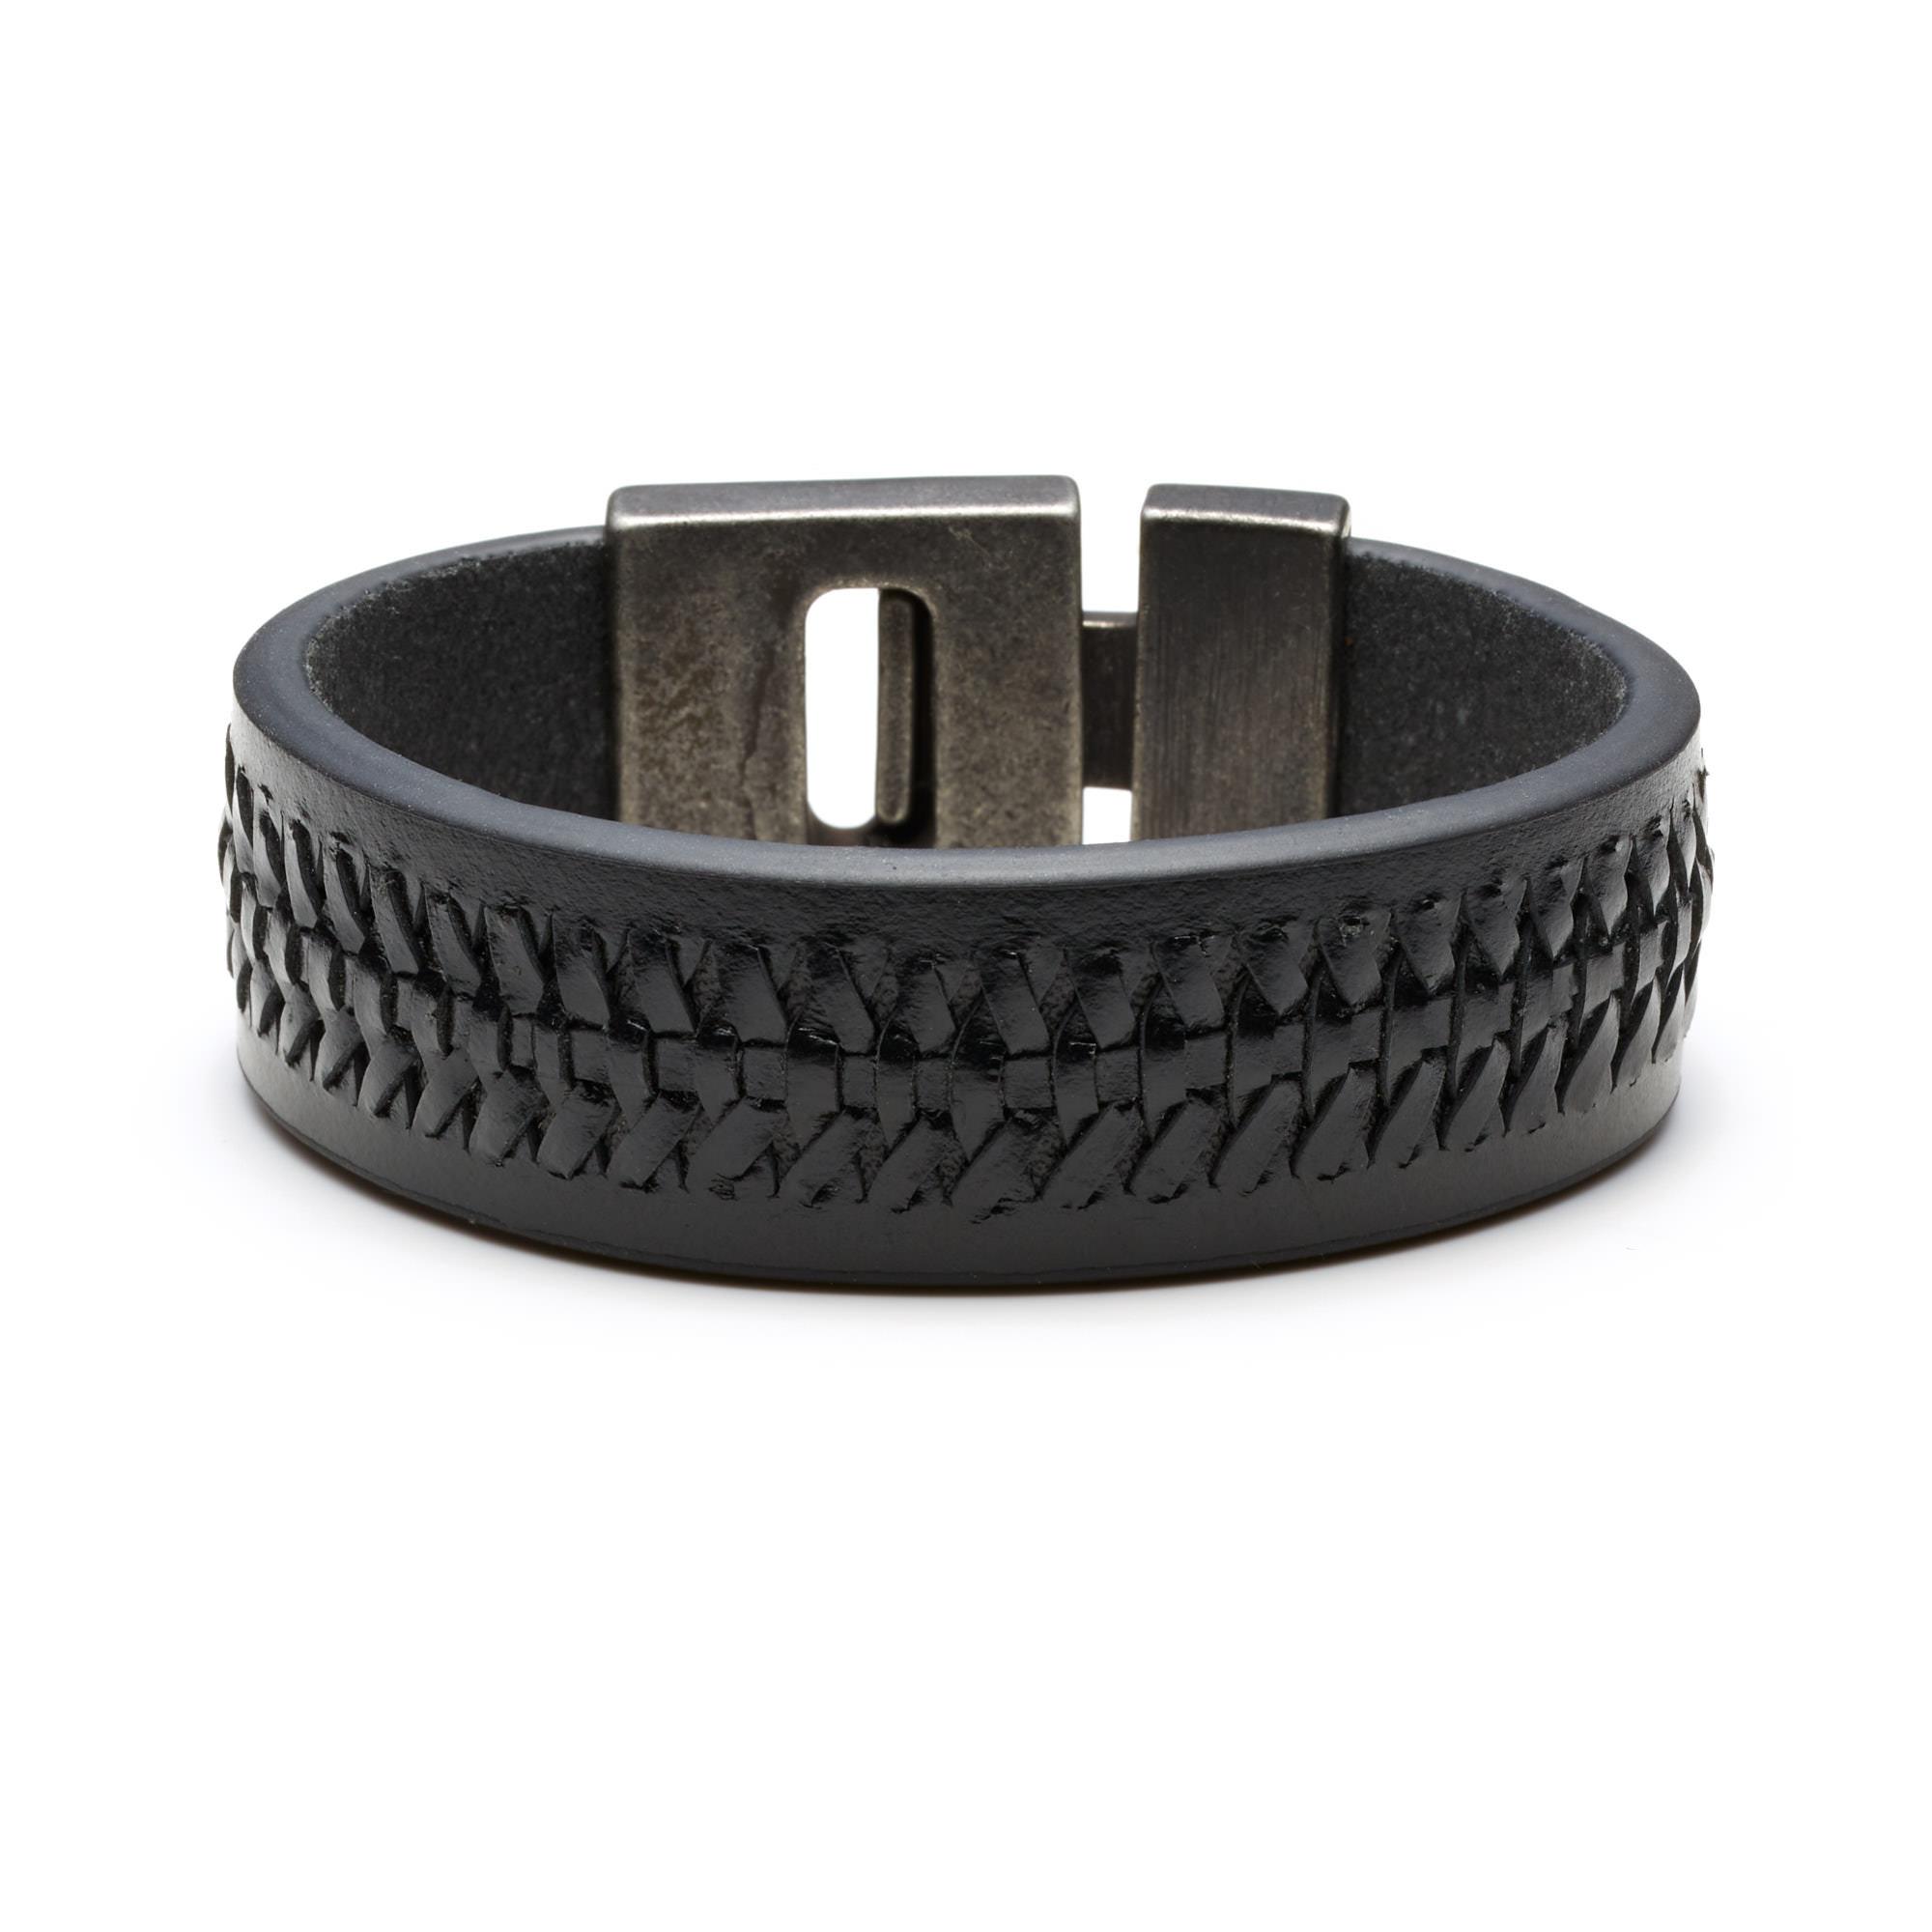 Sem Lewis Bakerloo Charing Cross braccialetto di pelle nero